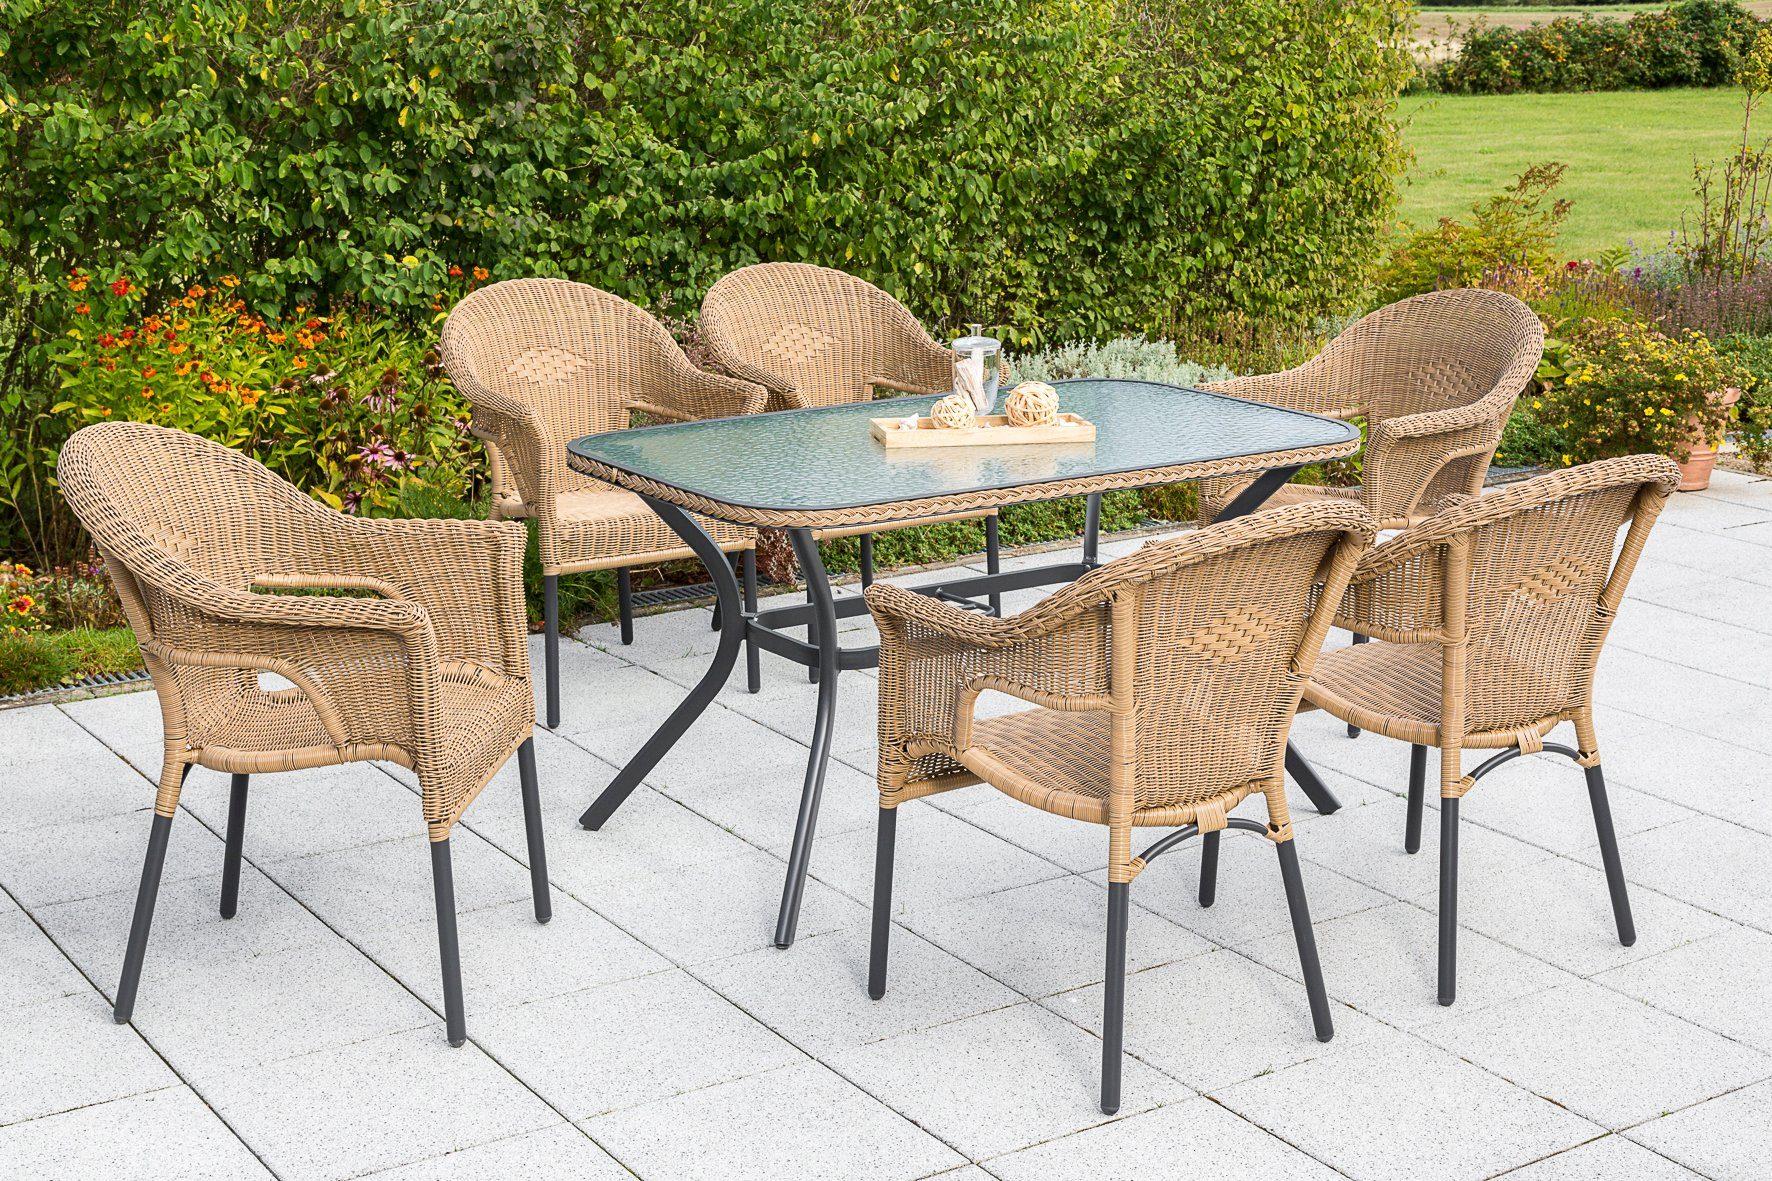 MERXX Gartenmöbelset »Ravenna«, 7tlg., 6 Sessel, Tisch, stapelbar, Polyrattan